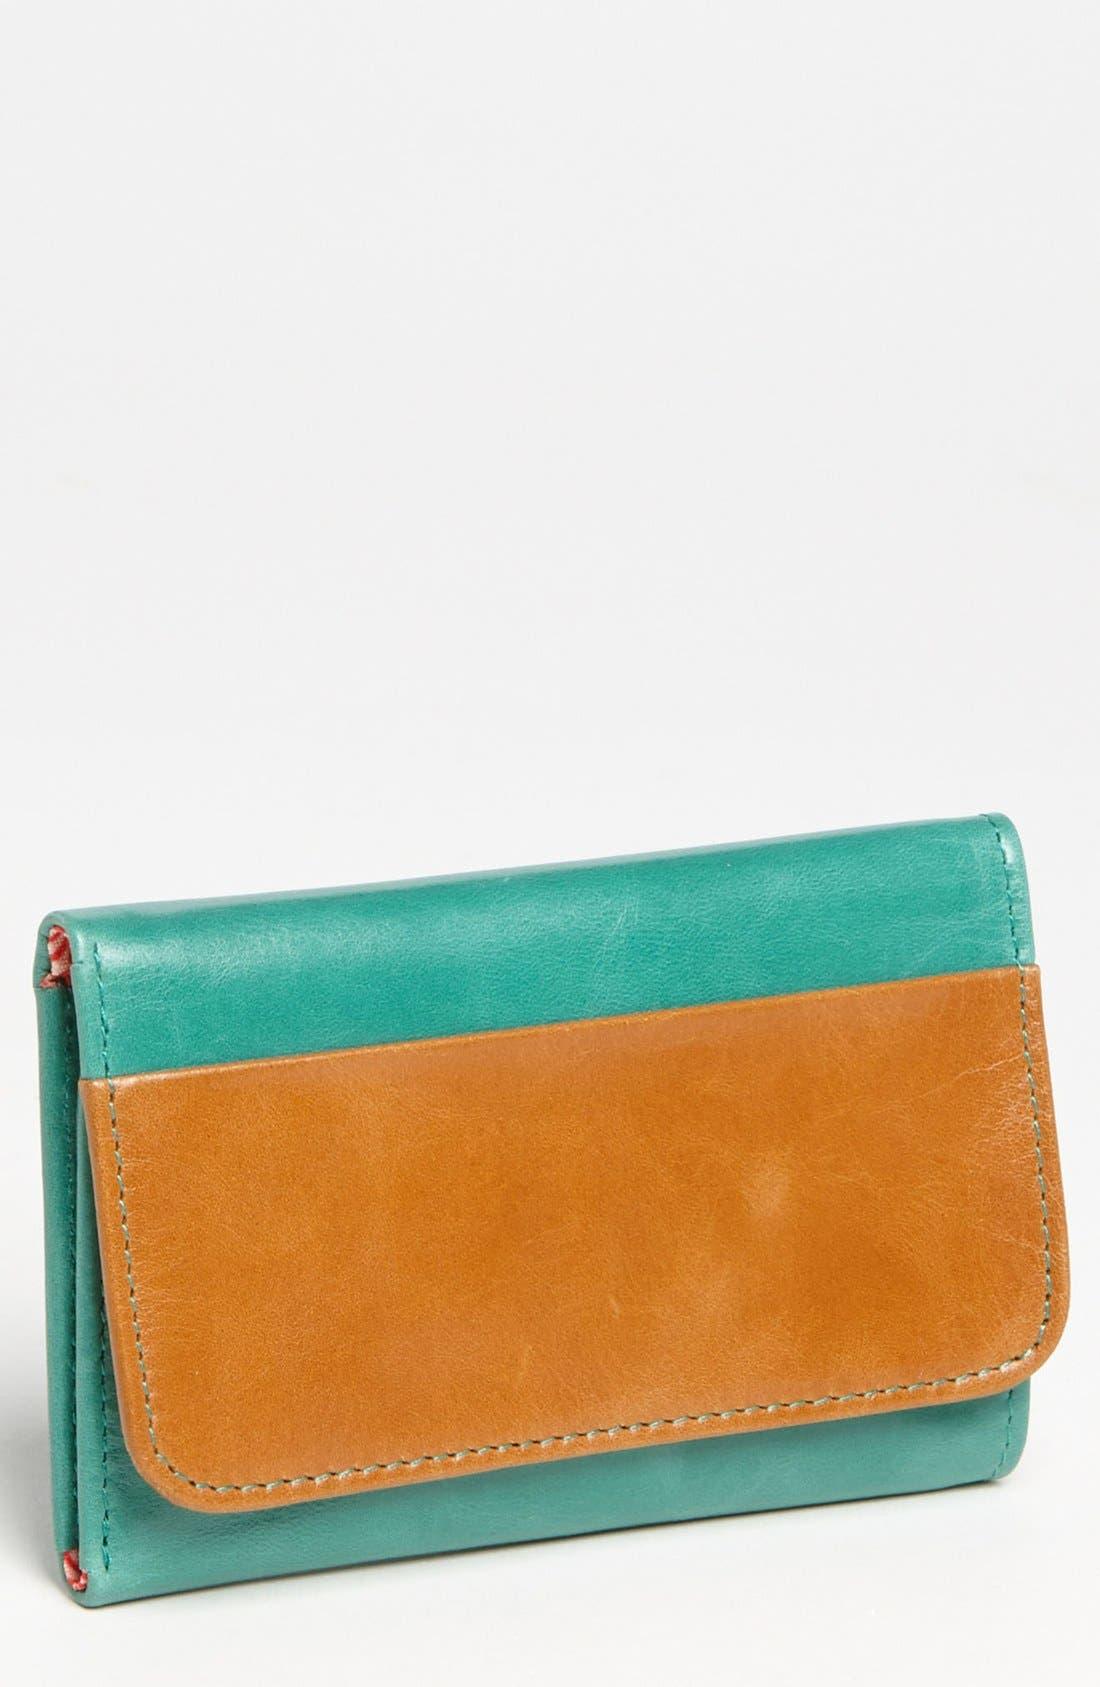 Main Image - Hobo 'Jill' Colorblock Wallet